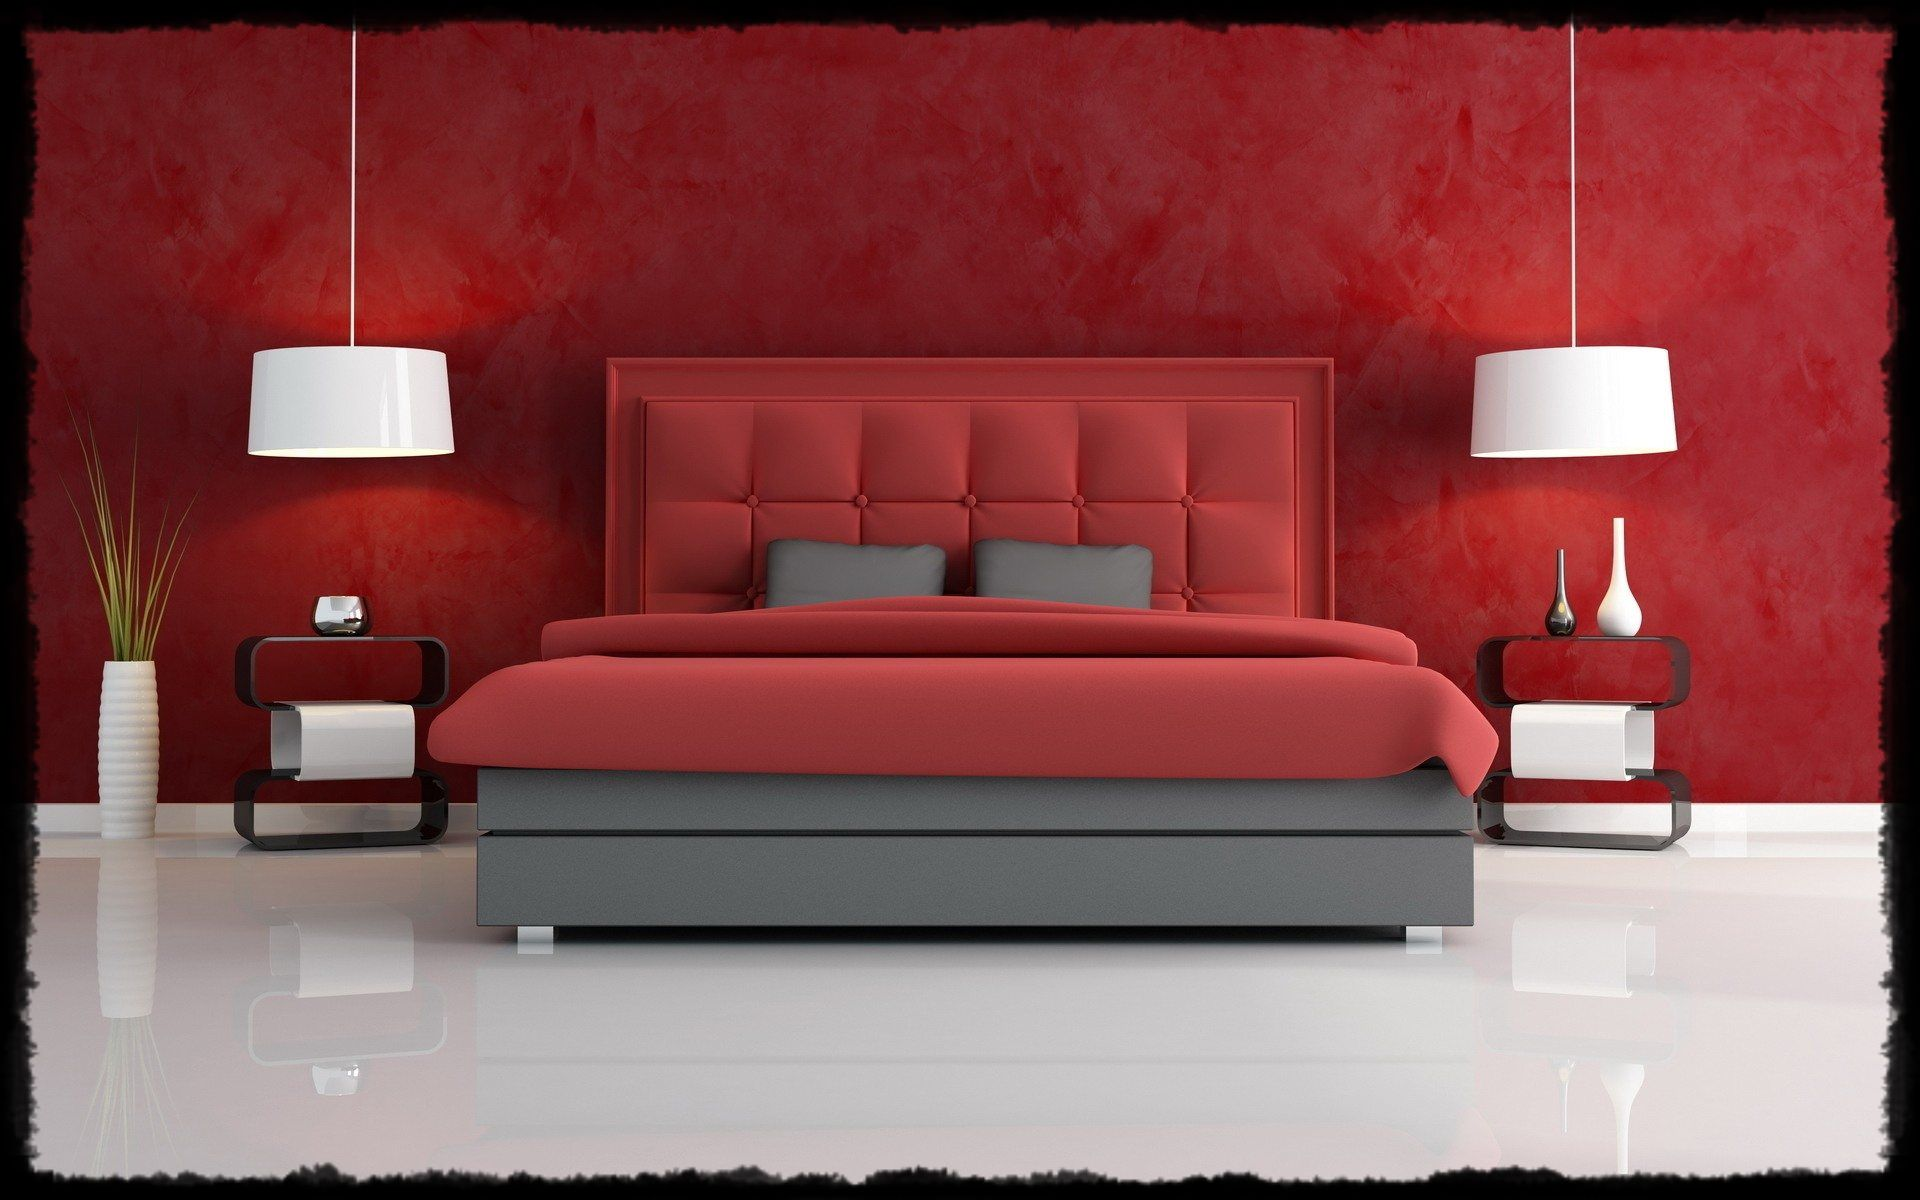 Bedroom Amazing Red Wallpaper Master Bedroom Decorating Ideas 1920x1200